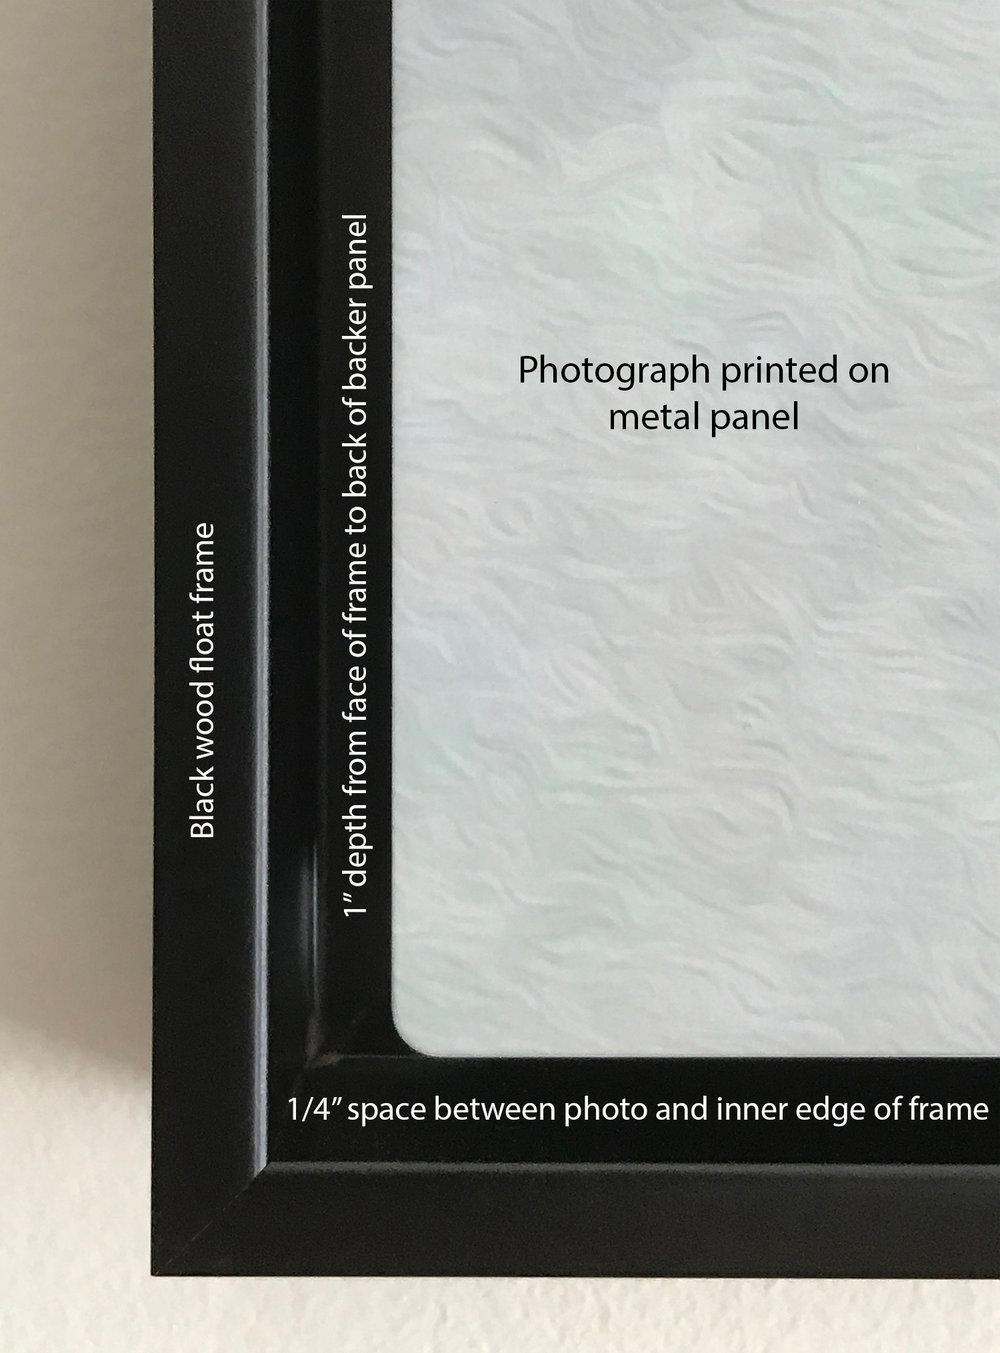 float_frame_details.jpg